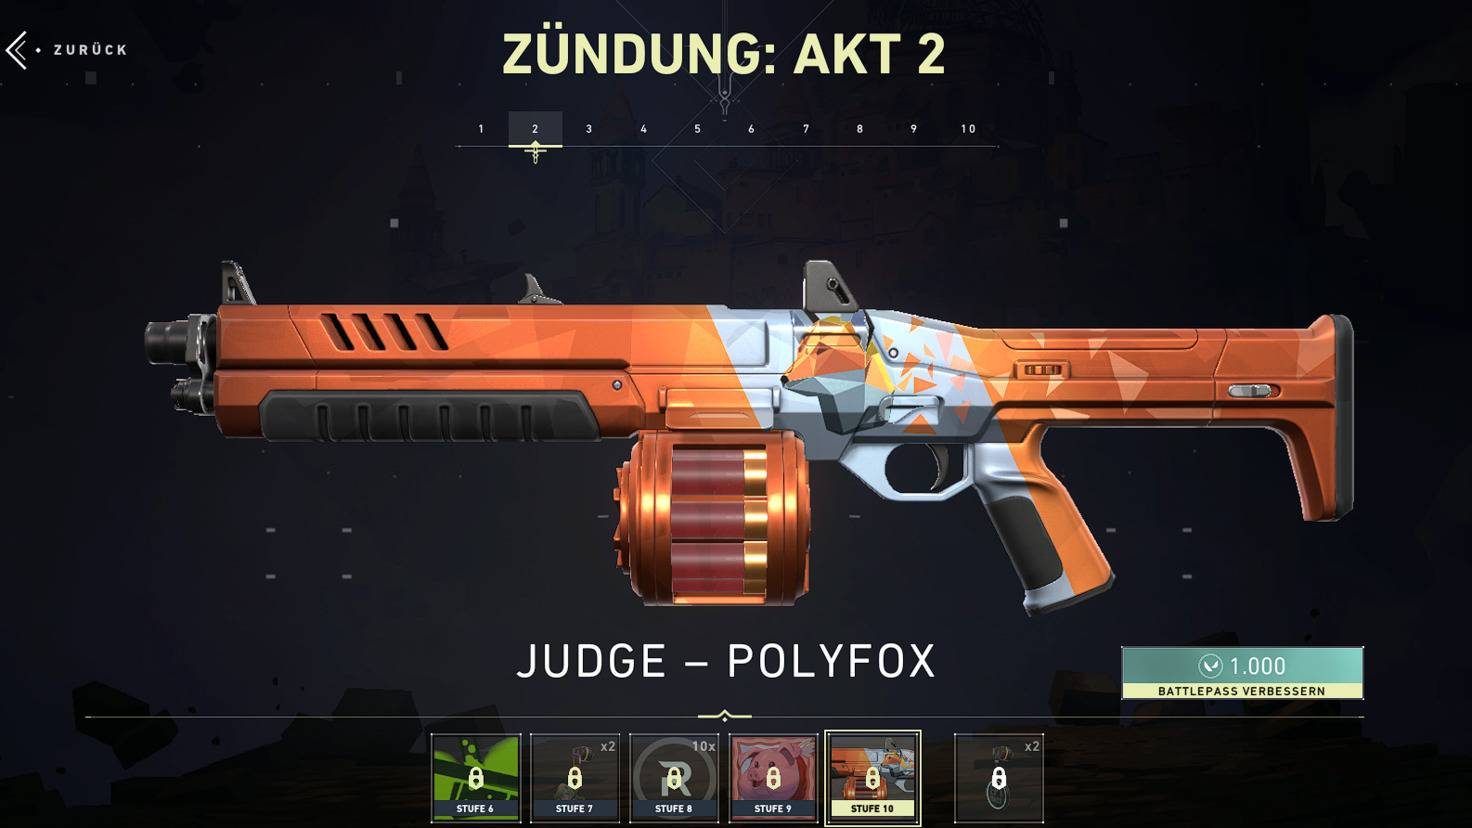 valorant-akt-2-judge-polyfox